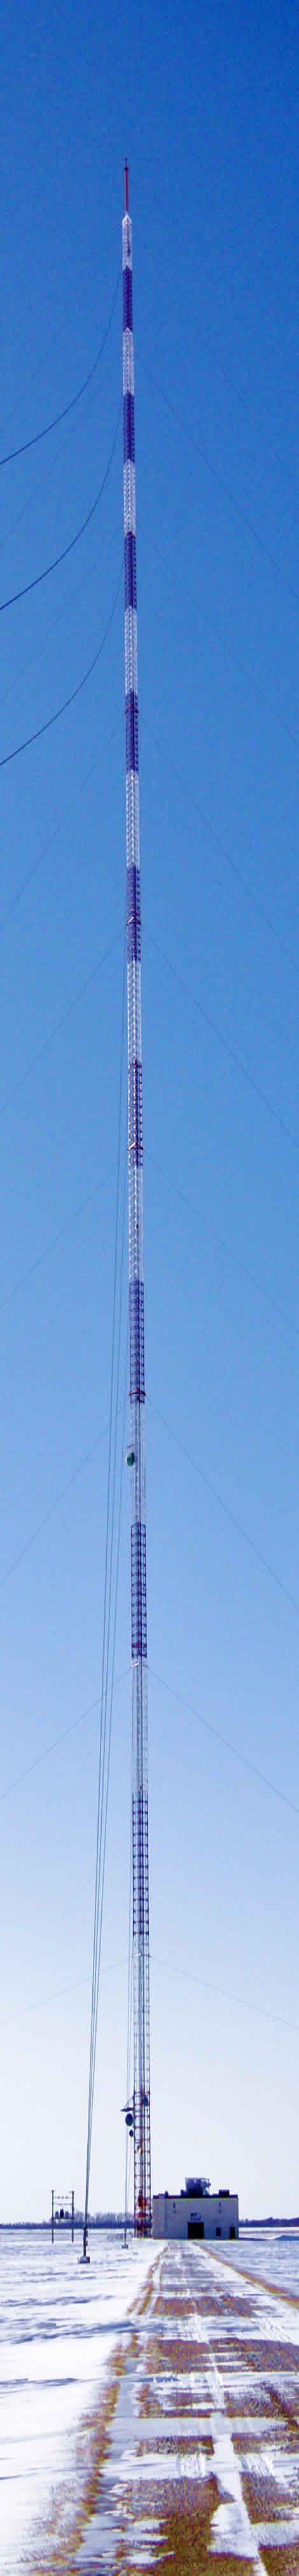 The World's Tallest Structure: The 2,063-Foot Tall KVLY-TV Mast Near Fargo, North Dakota